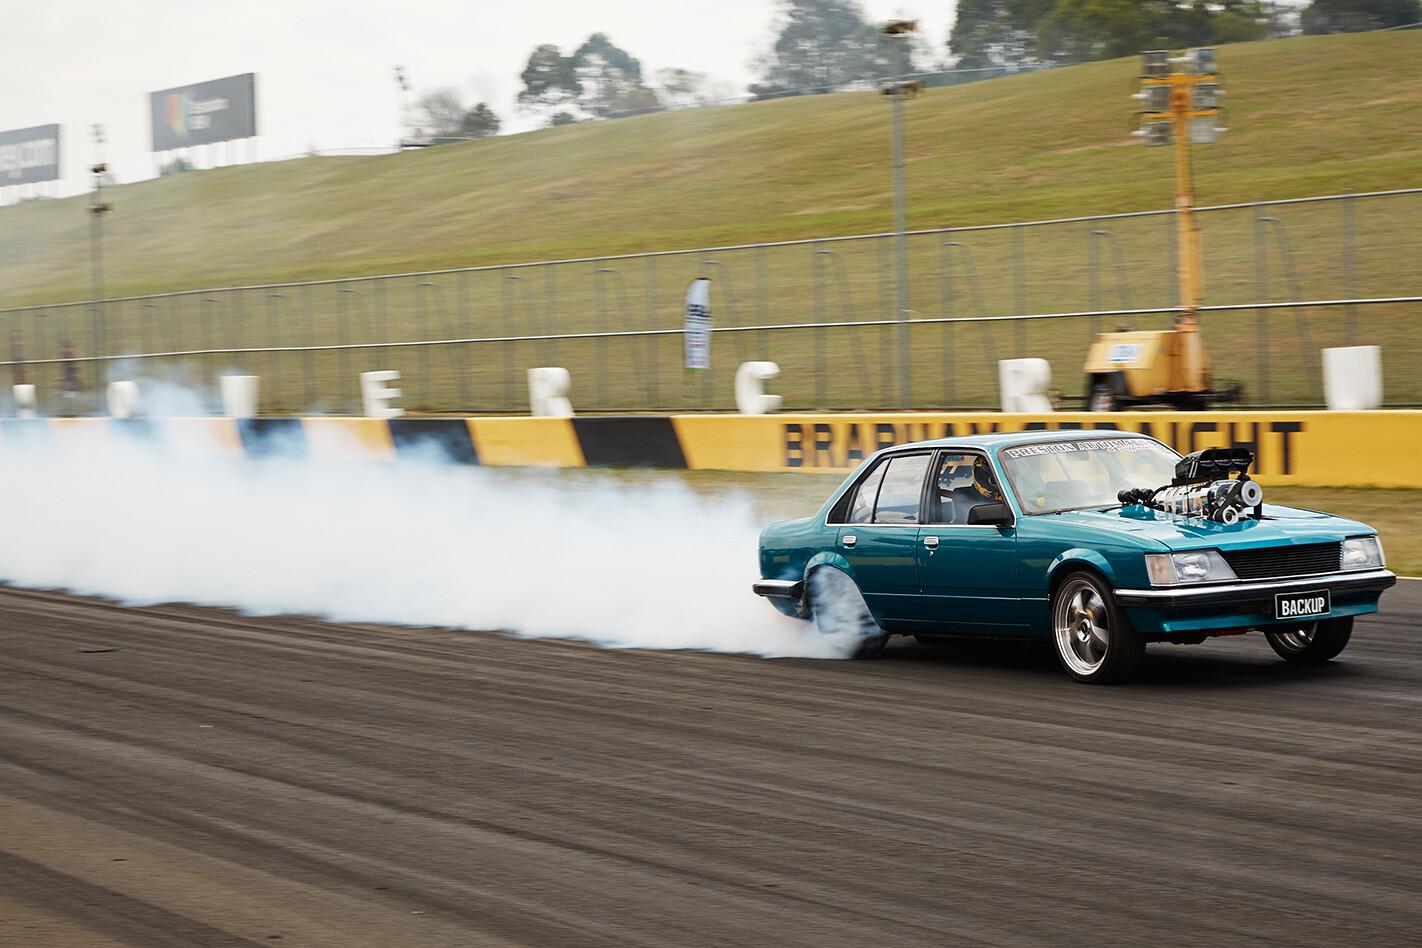 Brendan Cherry's Holden Commodore at Powercruise